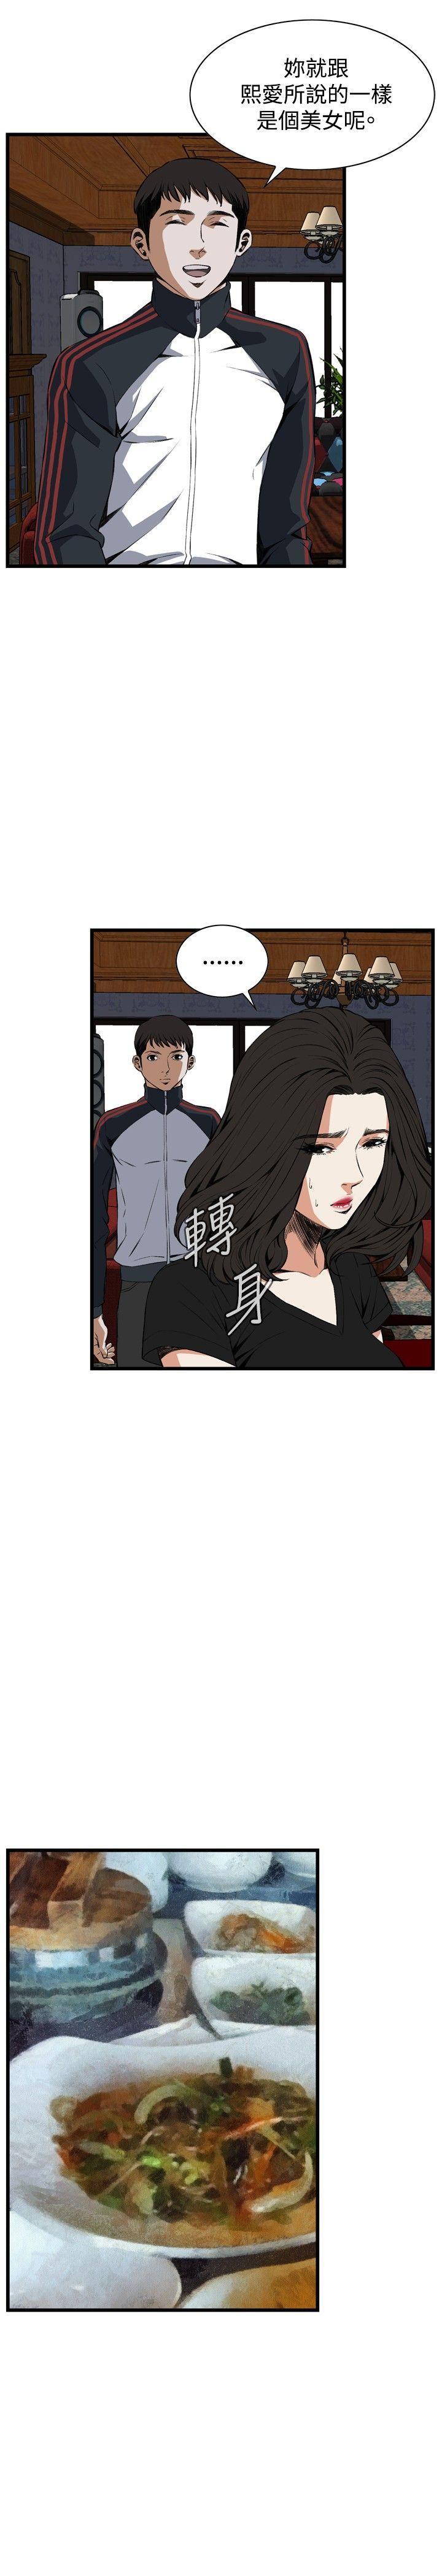 Take a Peek 偷窥 Ch.39~60 [Chinese]中文 542